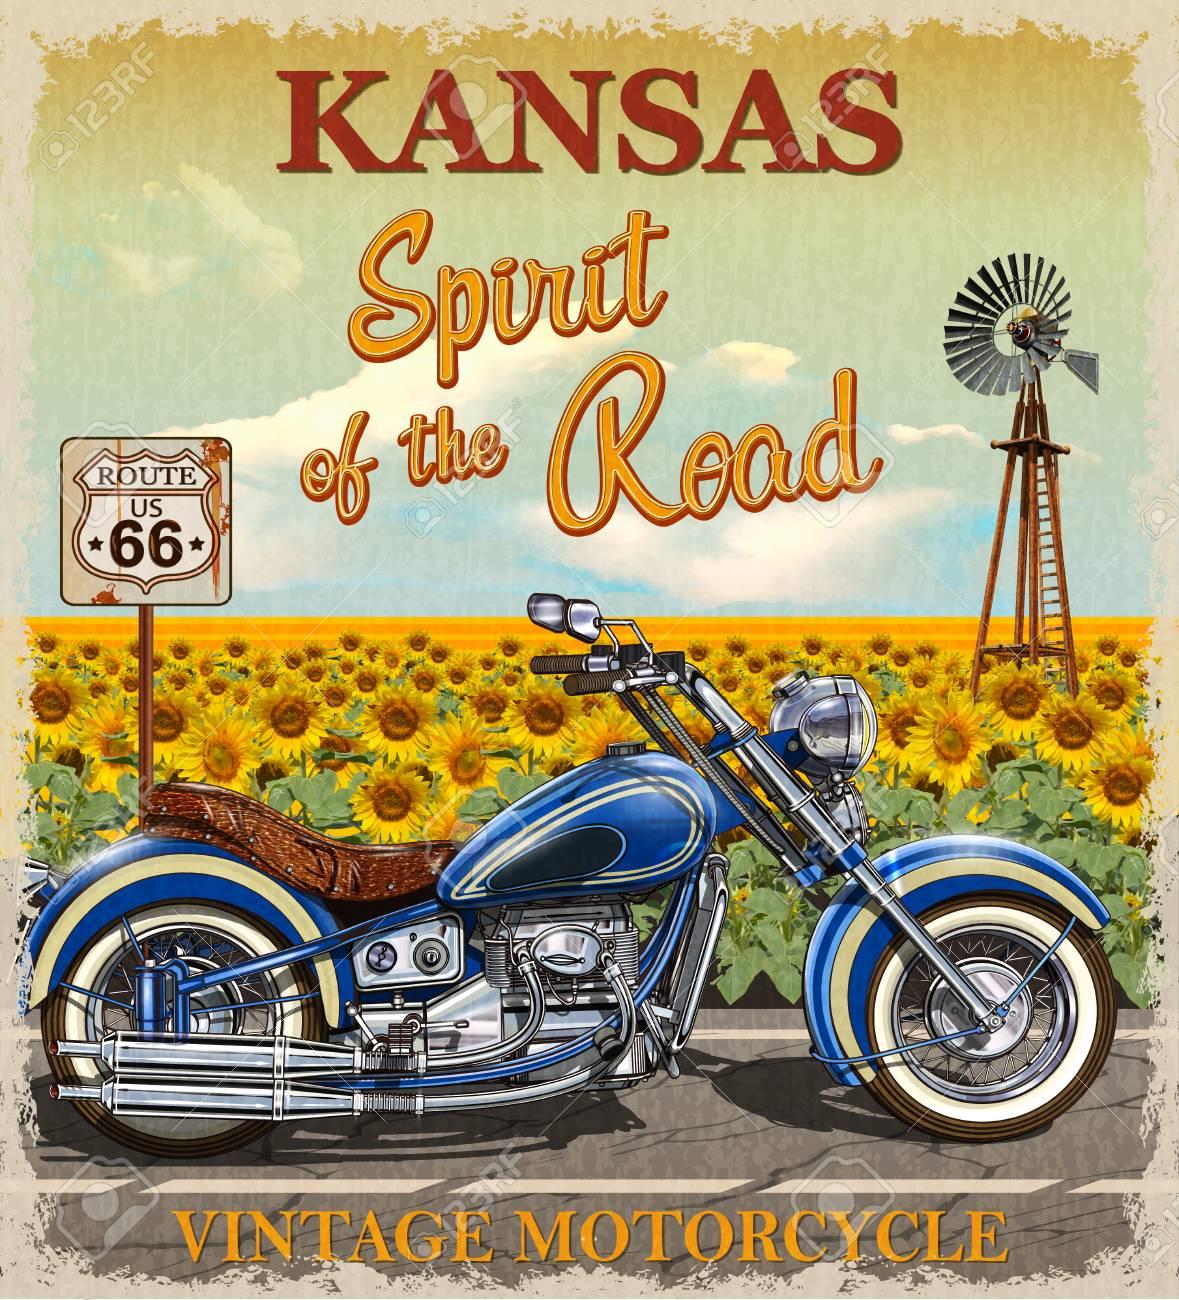 Vintage Route 66 Kansas motorcycle poster. - 90923042